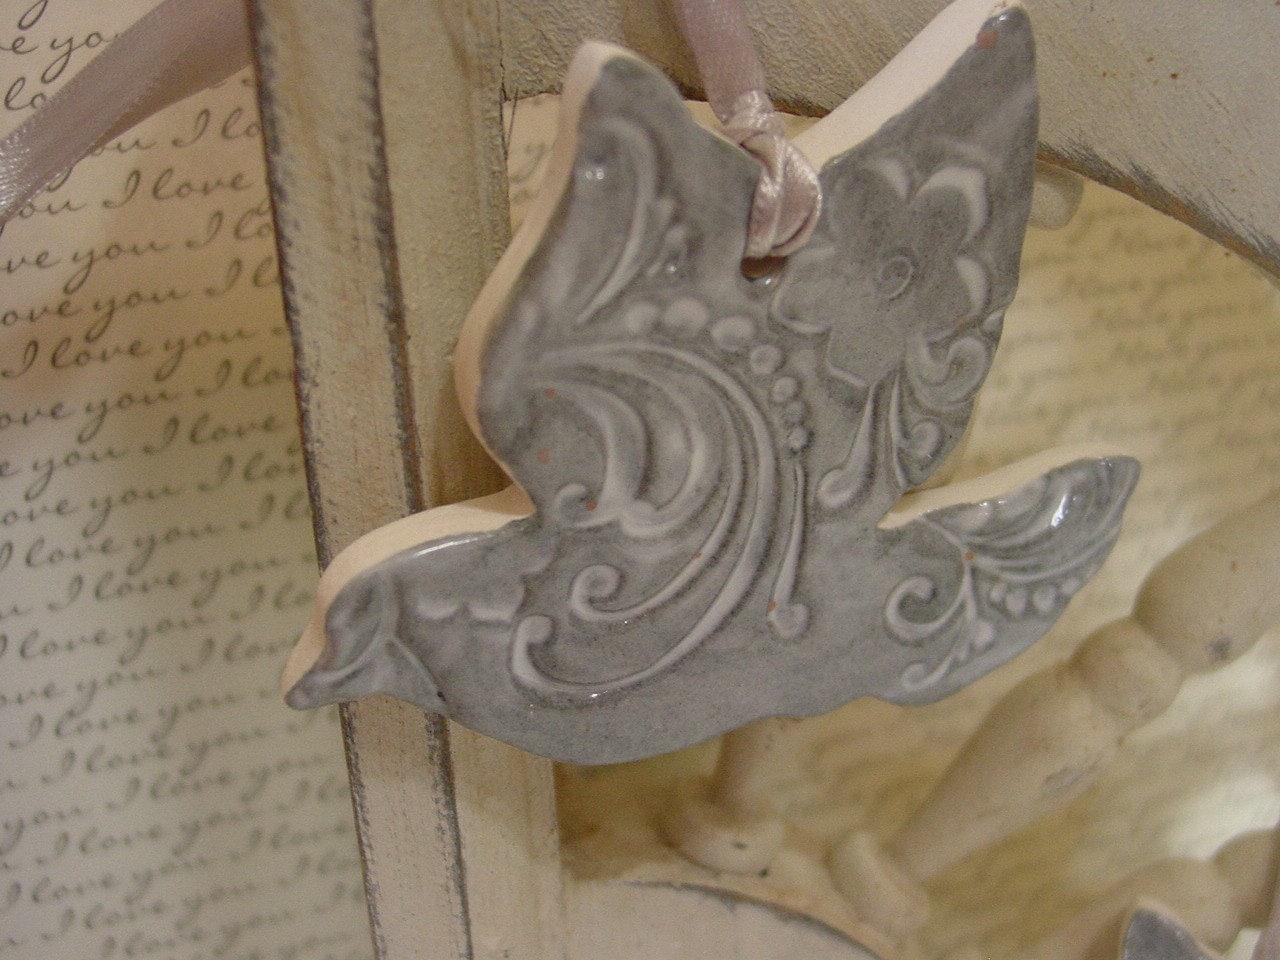 25 ceramic dove ornaments wedding favor by gardenspellghosttale